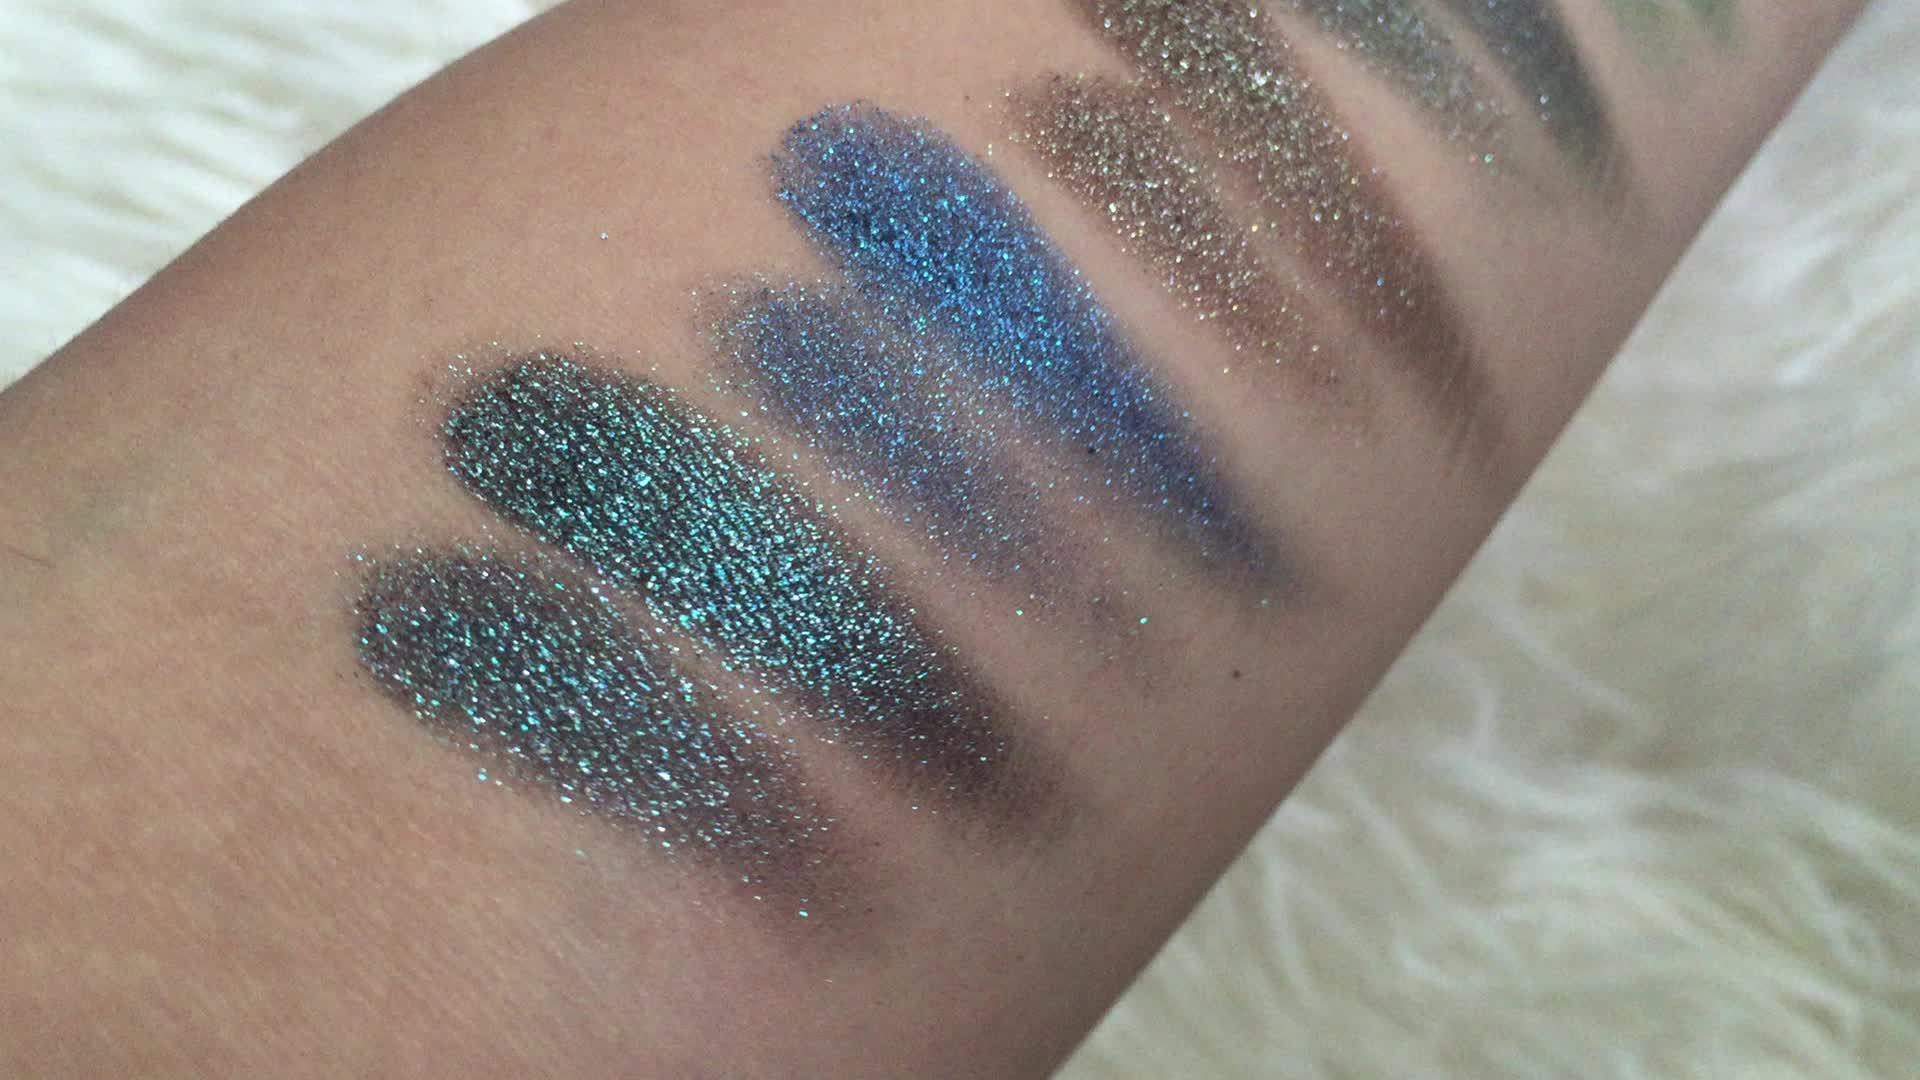 MakeupAddiction, makeupaddiction, 1 (reddit) GIFs